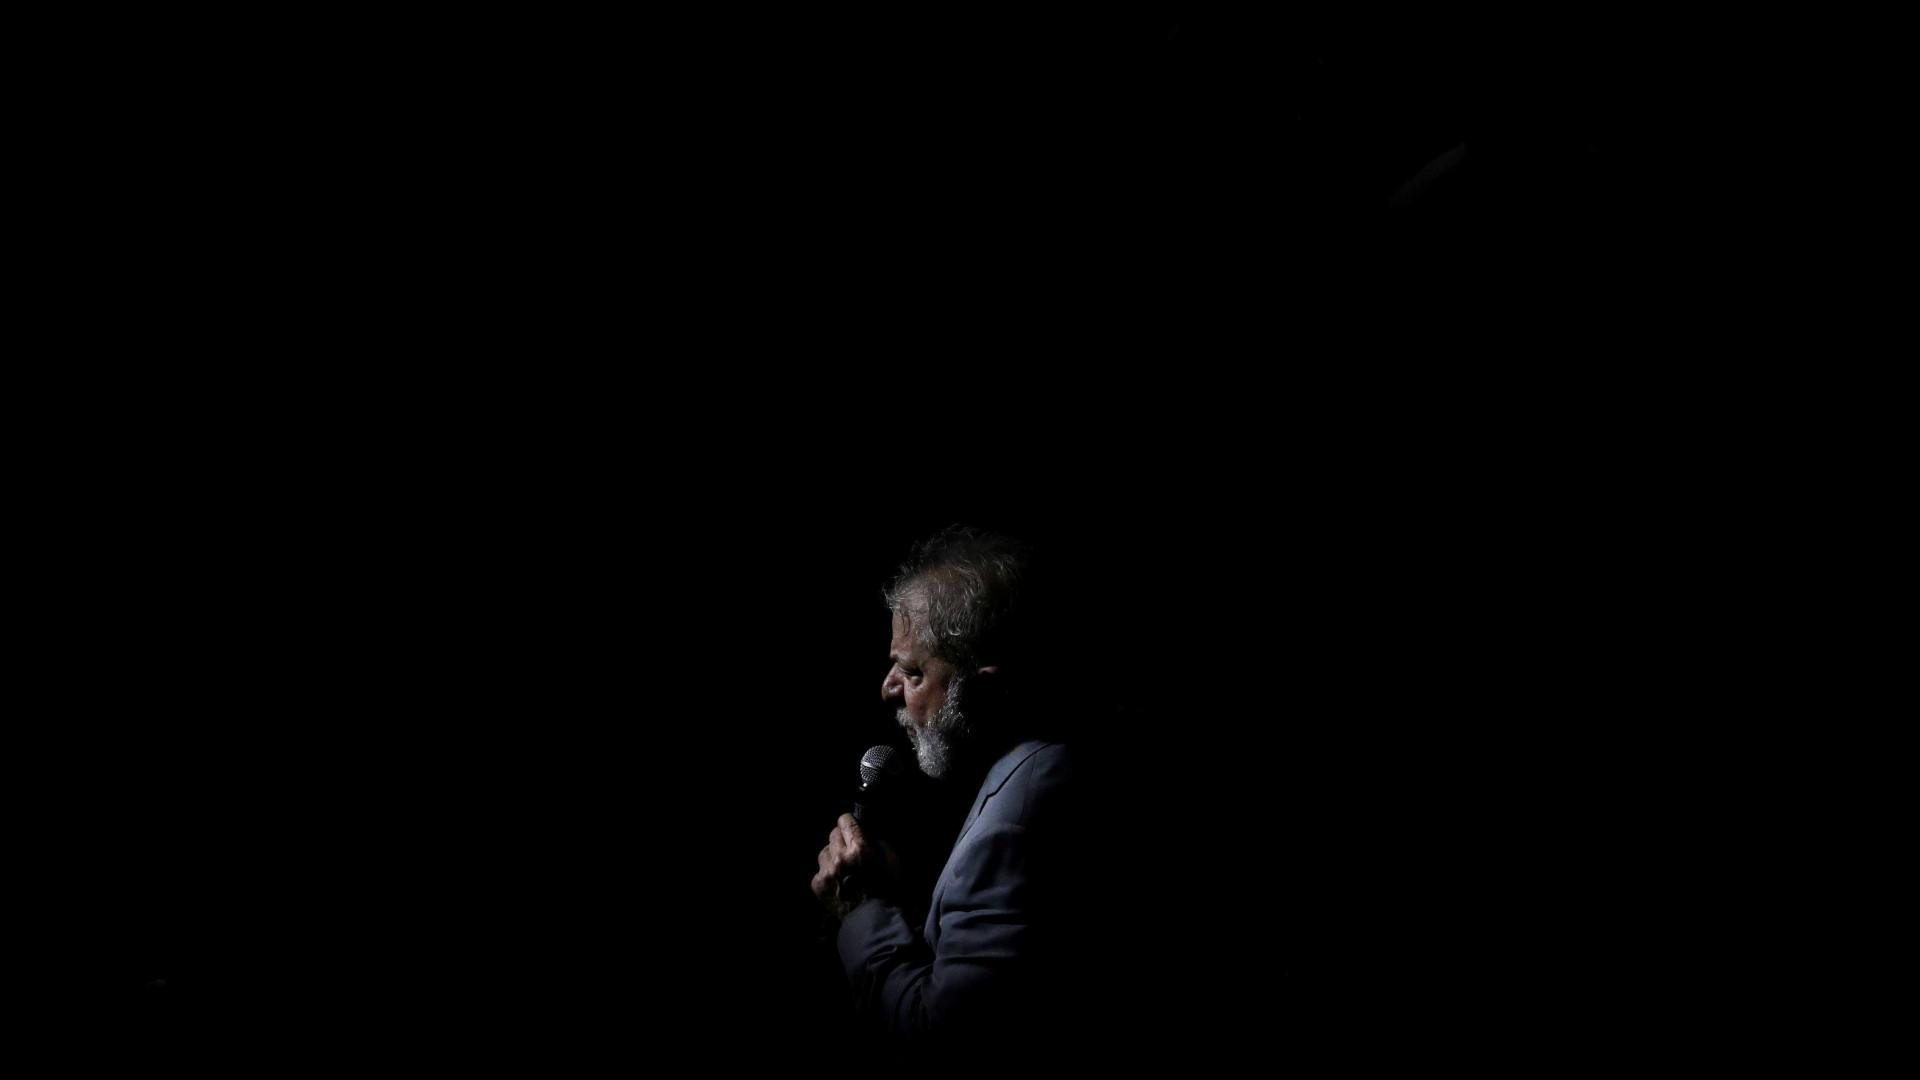 Vallisney mantém interrogatório de Lula na Zelotes para quinta-feira